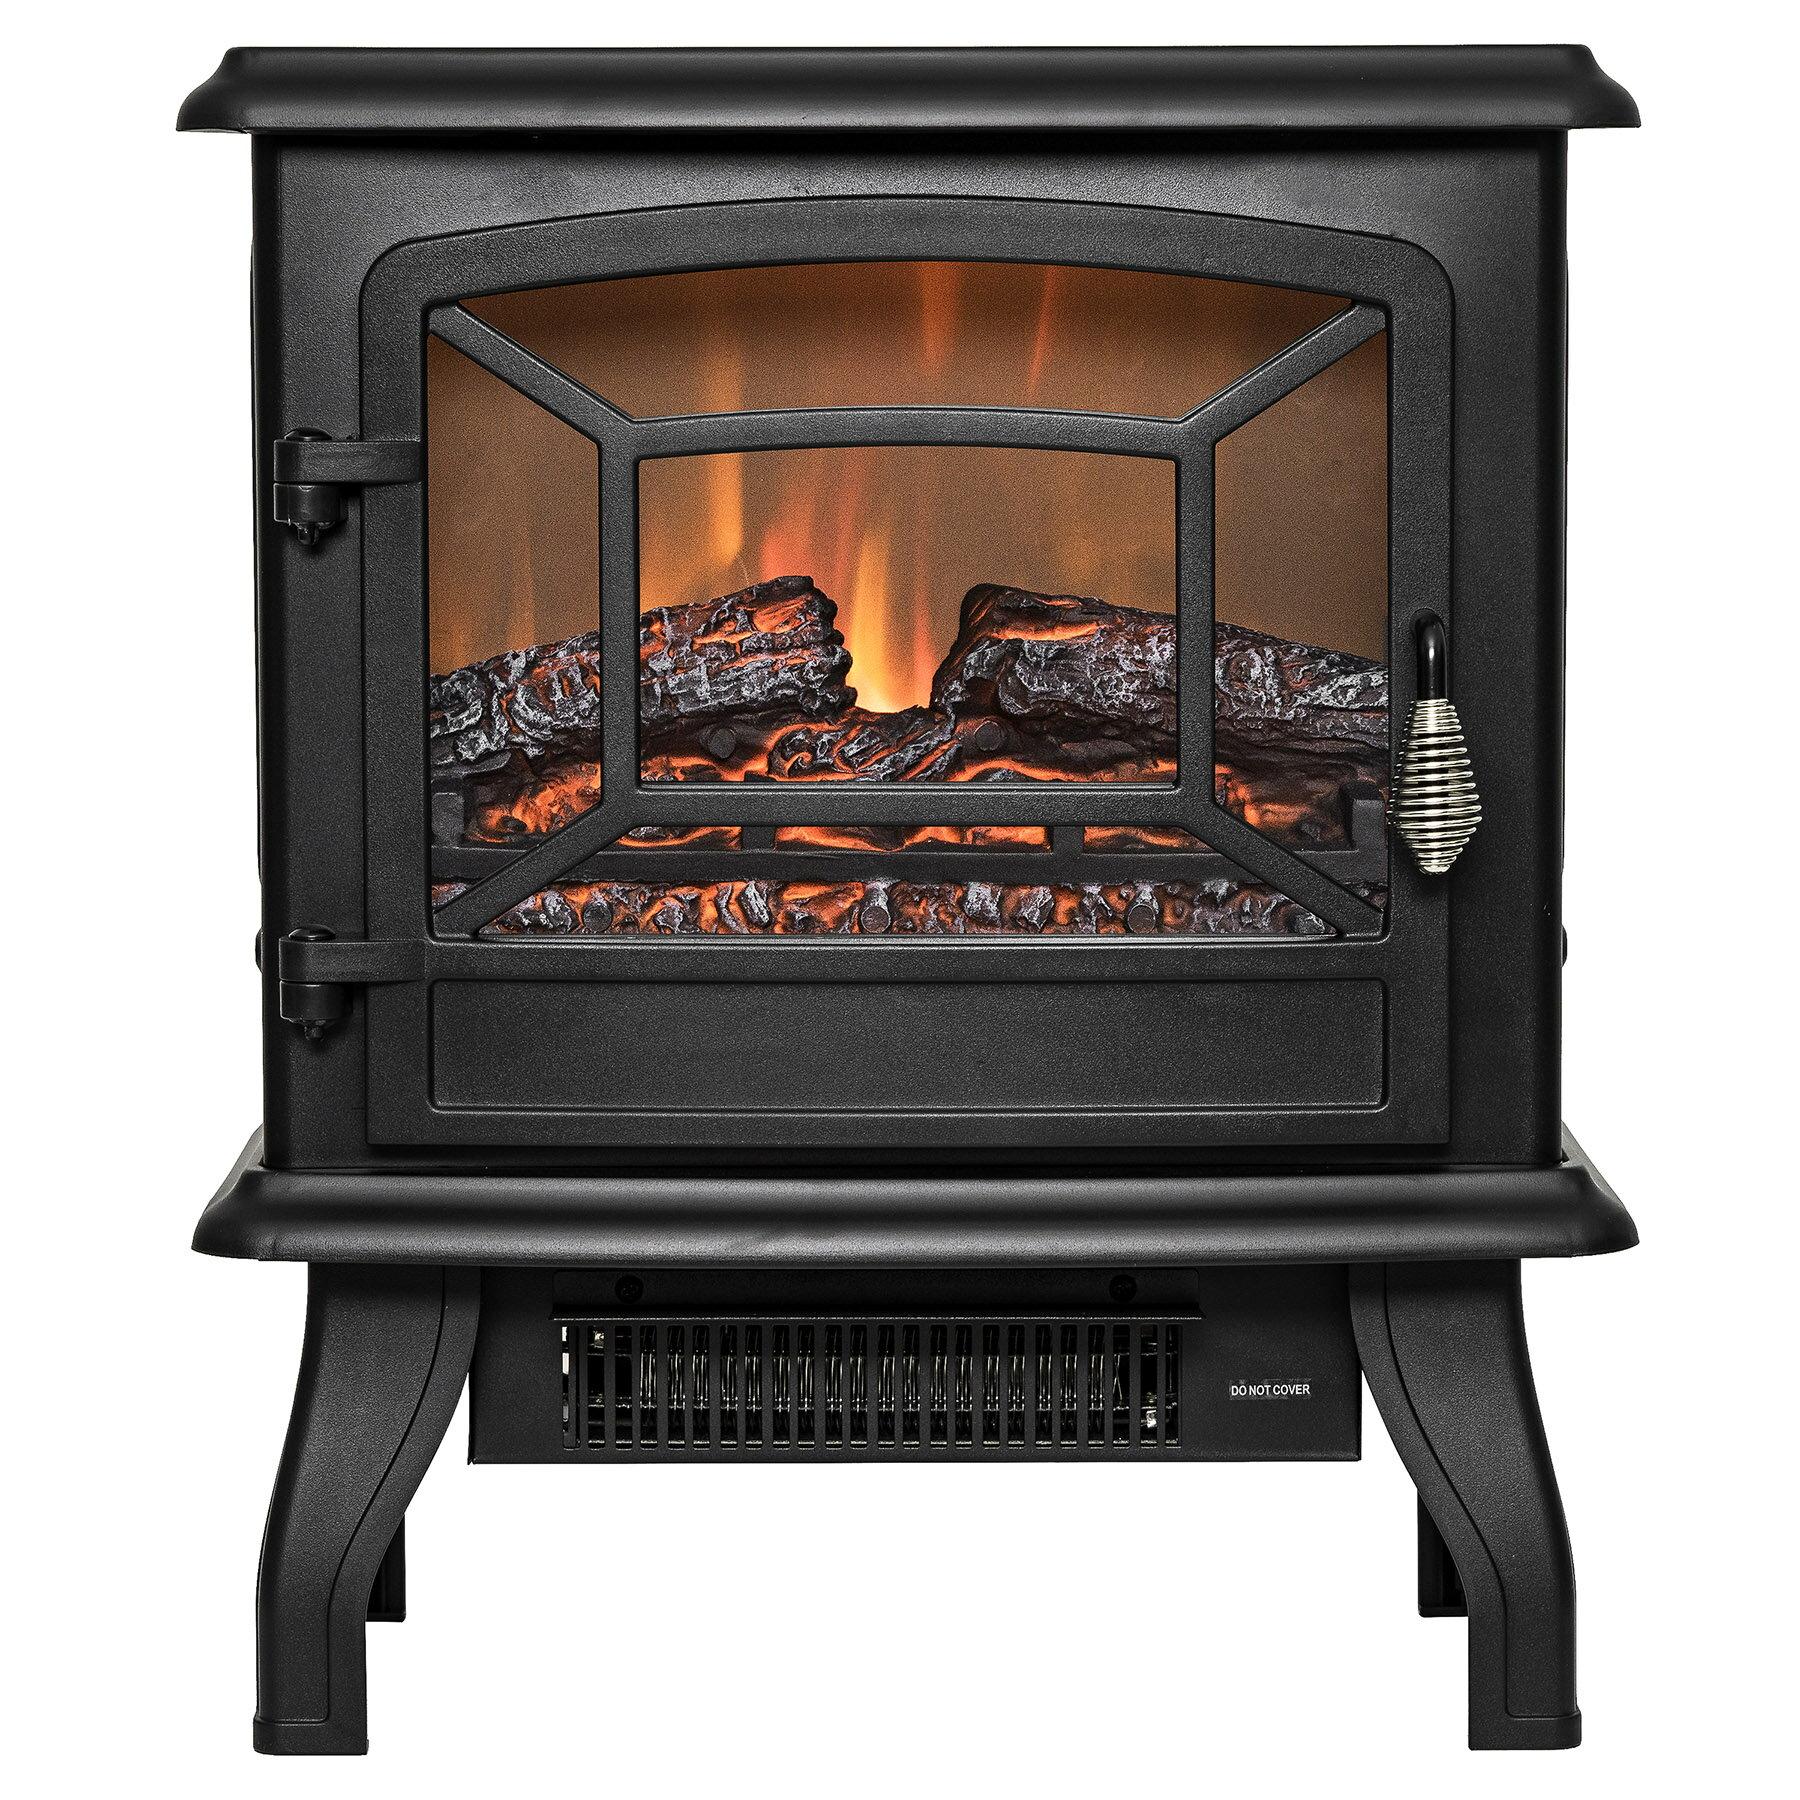 Akdy Akdy 17 Black Finish Freestanding Portable Electric Fireplace